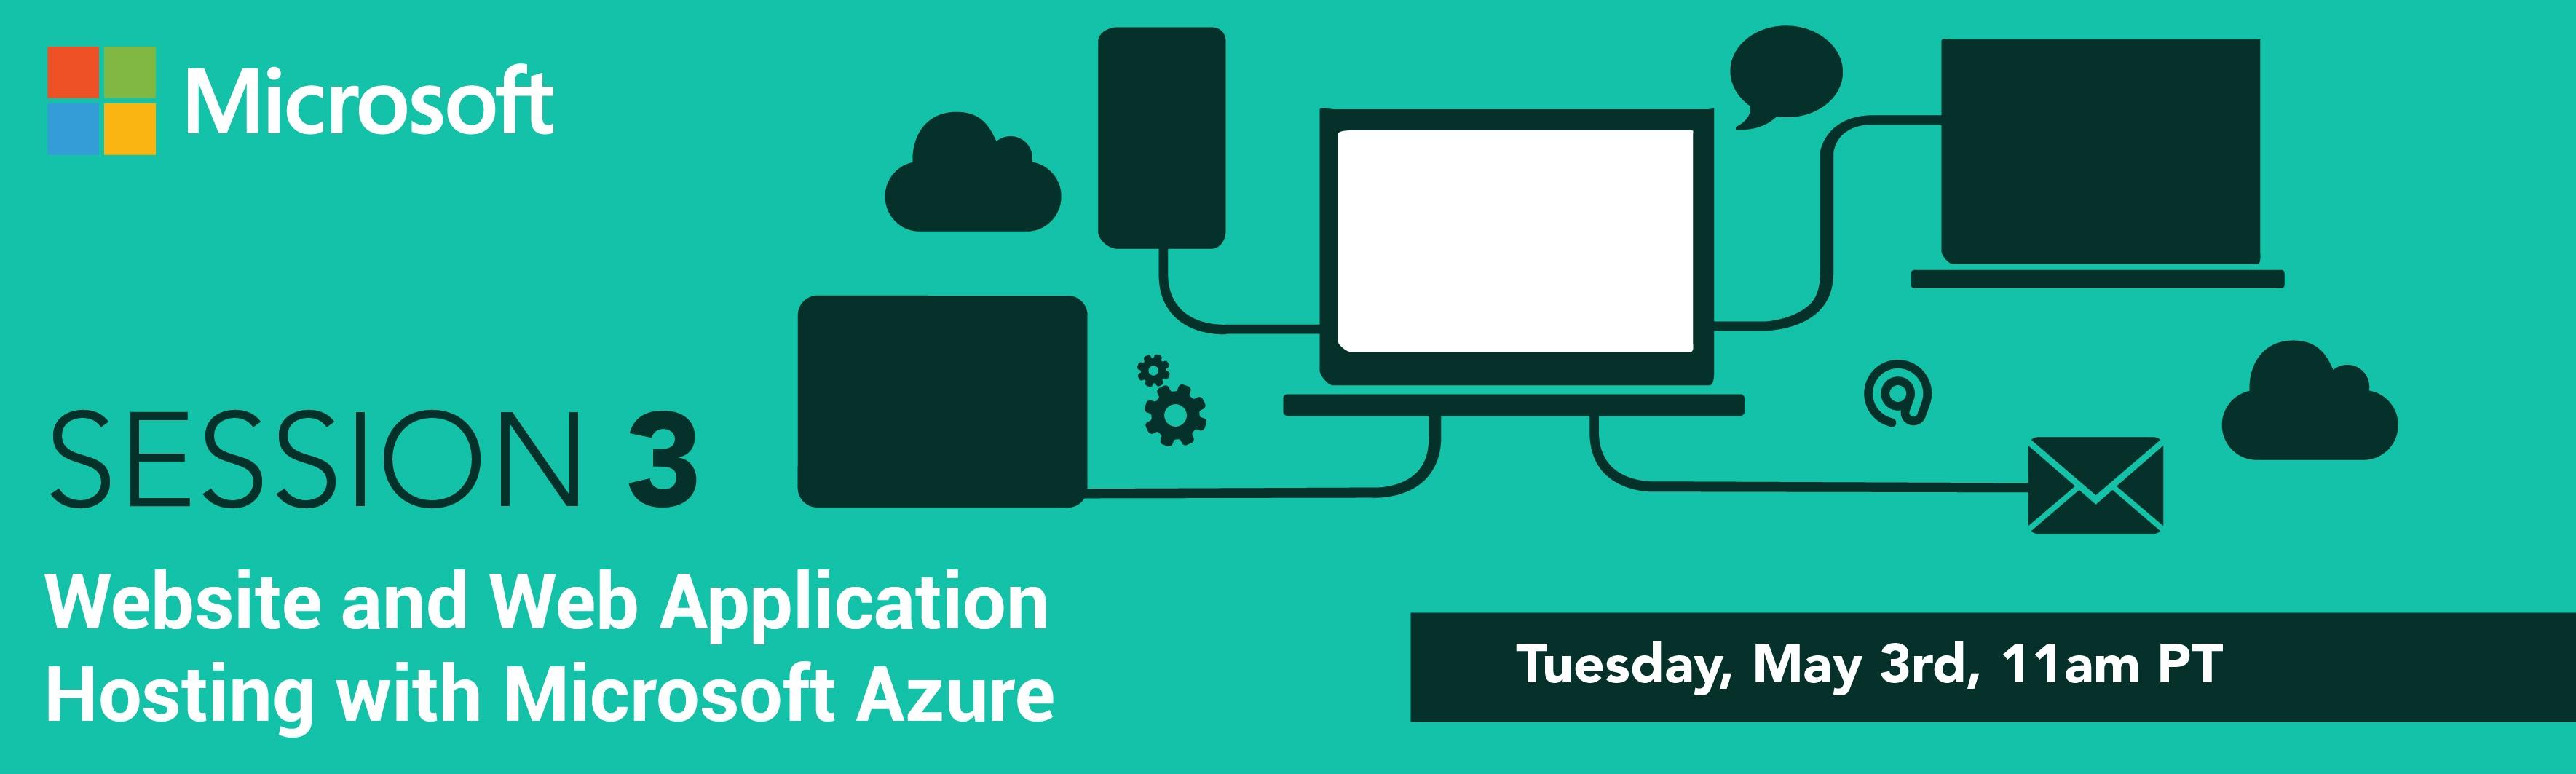 Azure Edu Webinar - Session 3